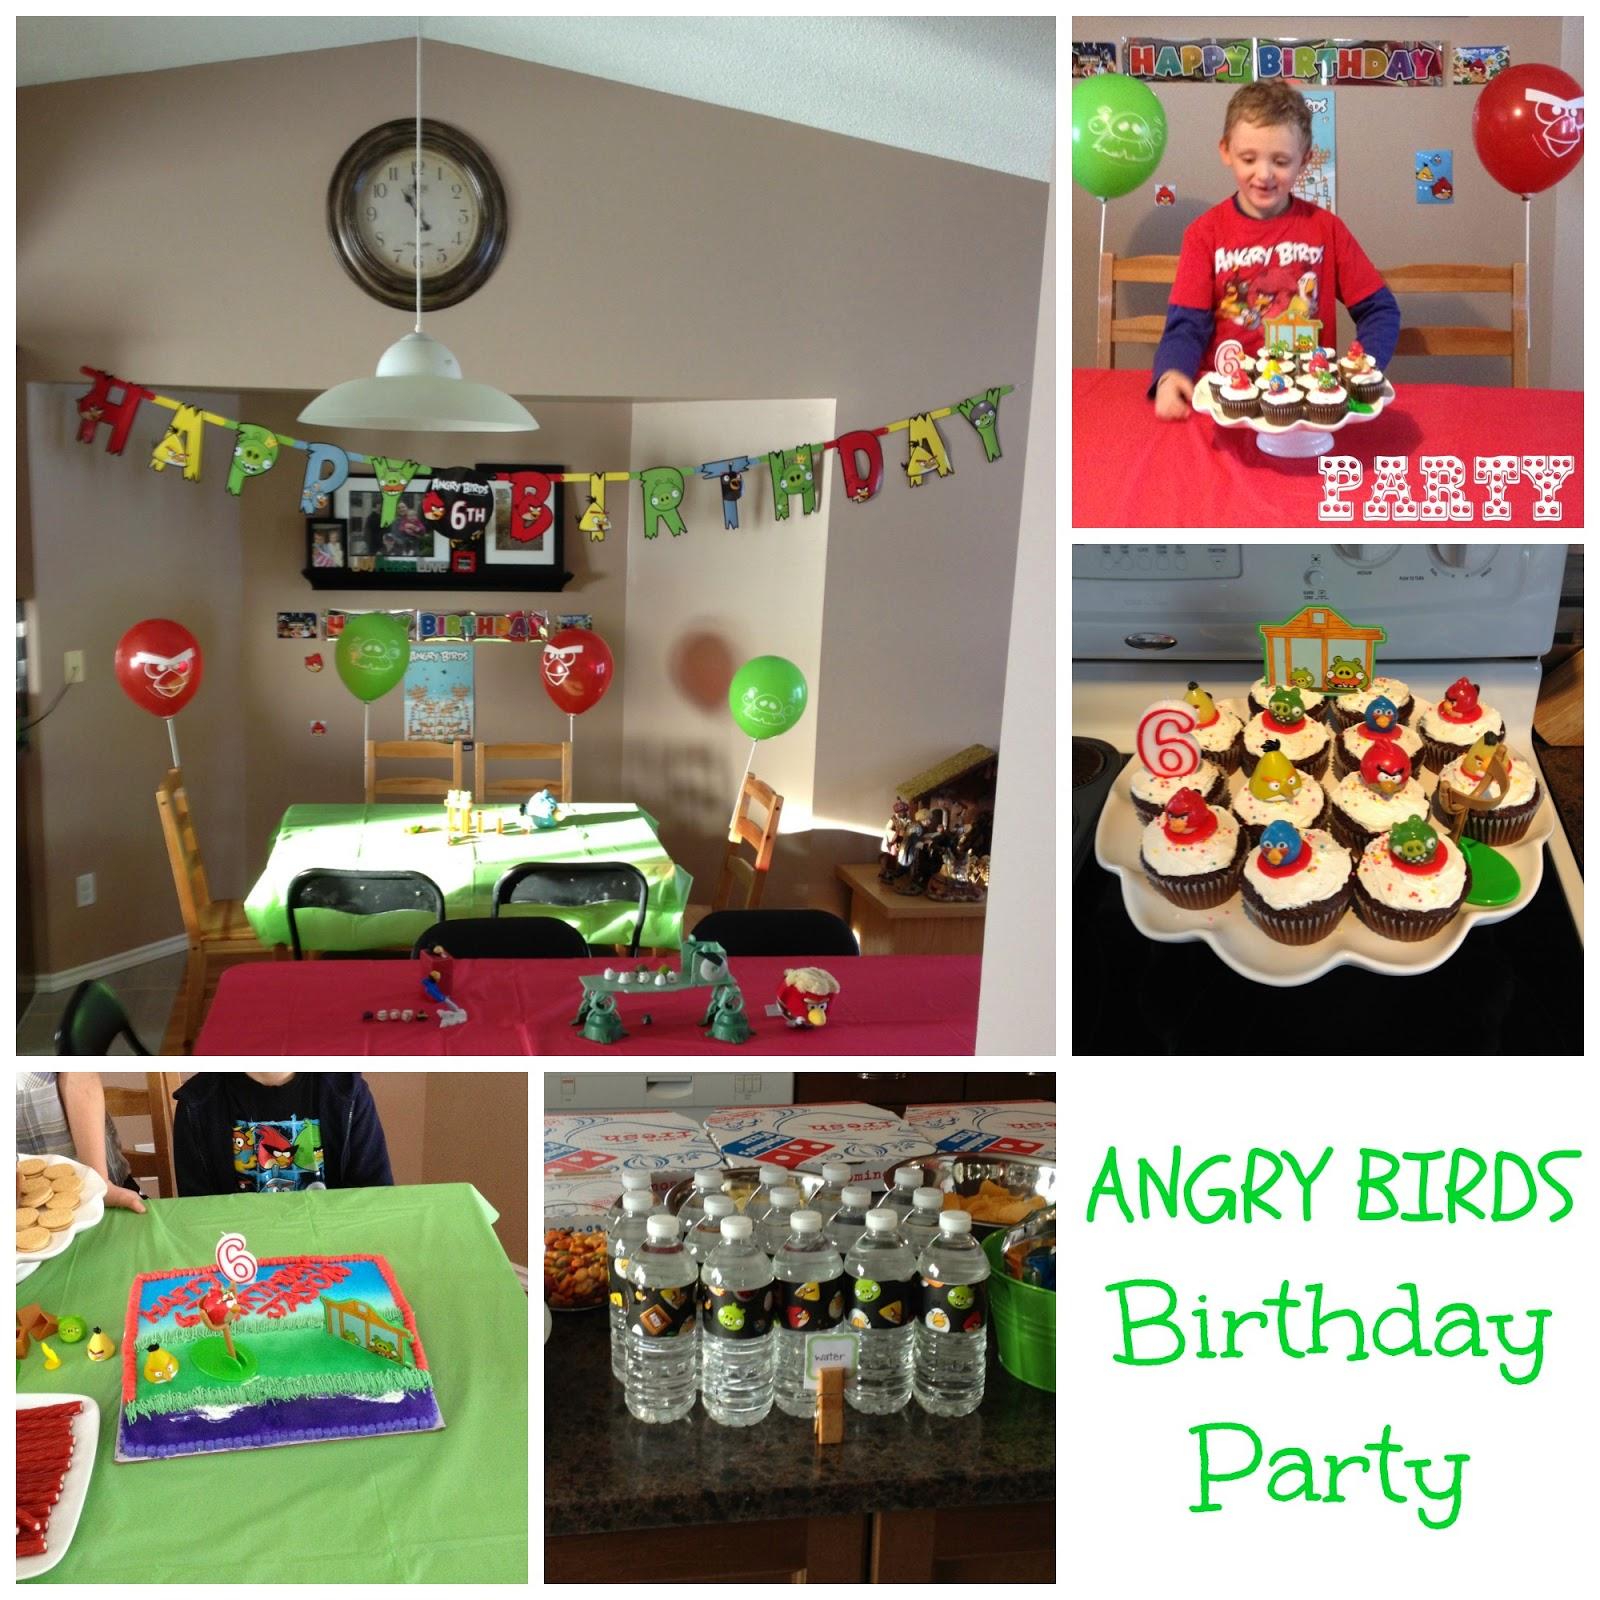 http://craftingandcreativity.blogspot.ca/2014/09/my-sons-6th-birthday-party-angry-birds.html